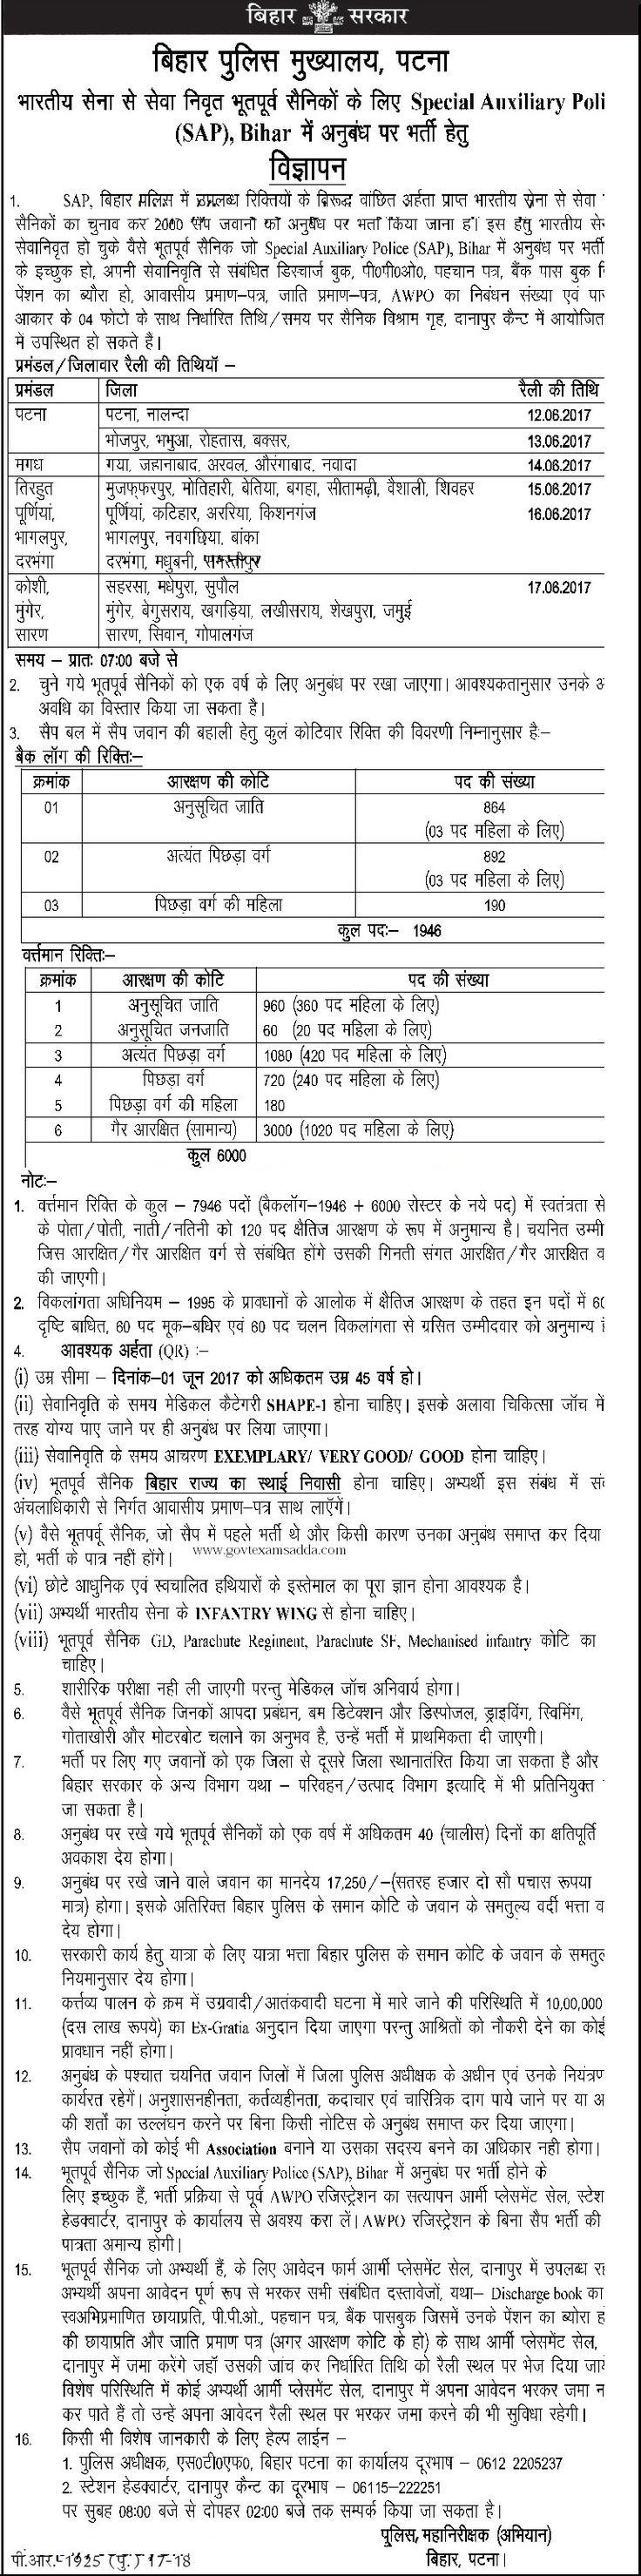 Roblox gear id code list bing images - Bihar Sap Recruitment 2017 Bihar Police 7946 Special Auxiliary Police Vacancies Rally Bihar Police